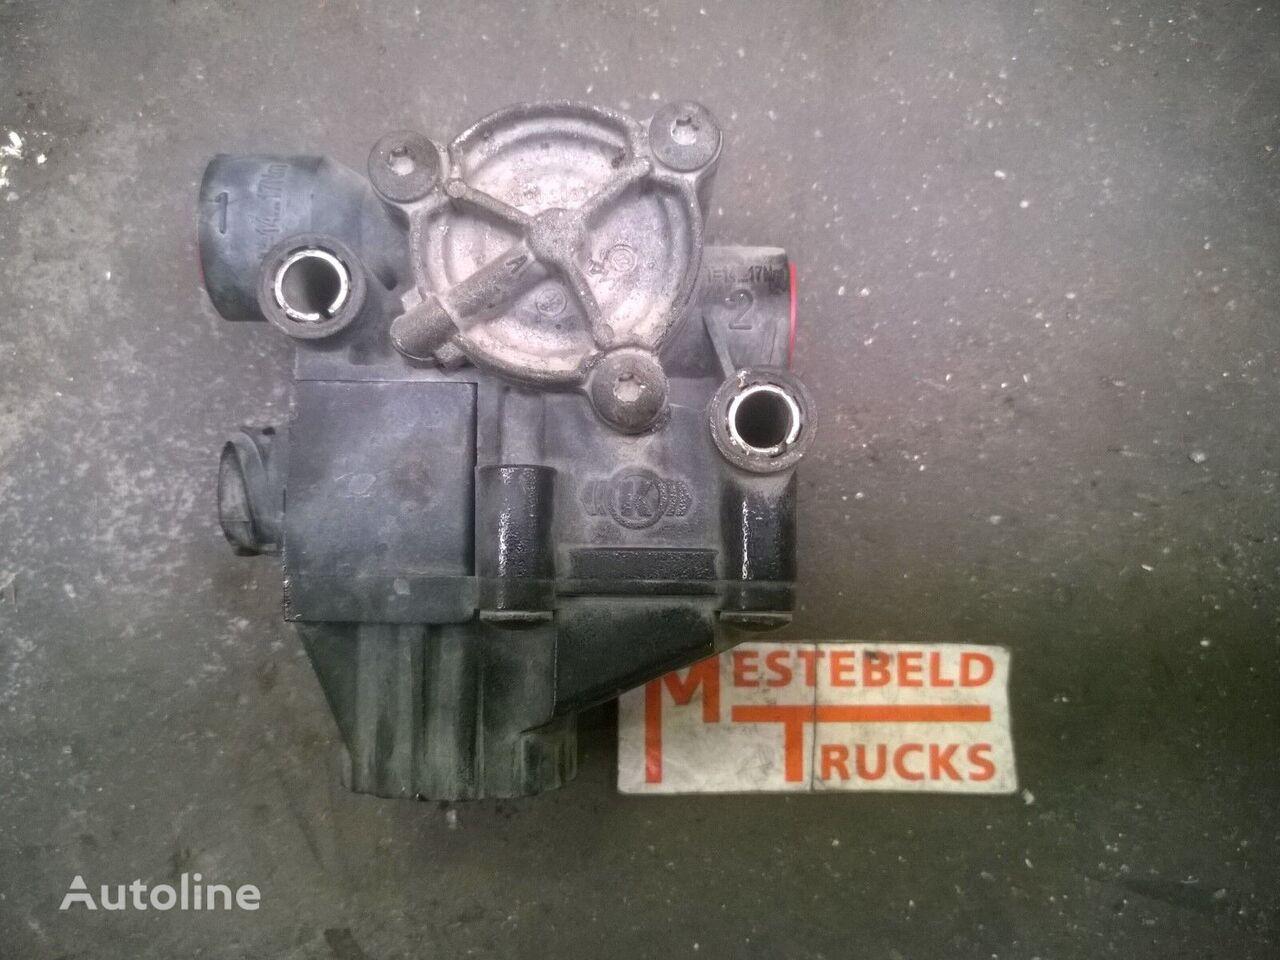 ABS magneetventiel valve for MAN ABS magneetventiel L2000 truck